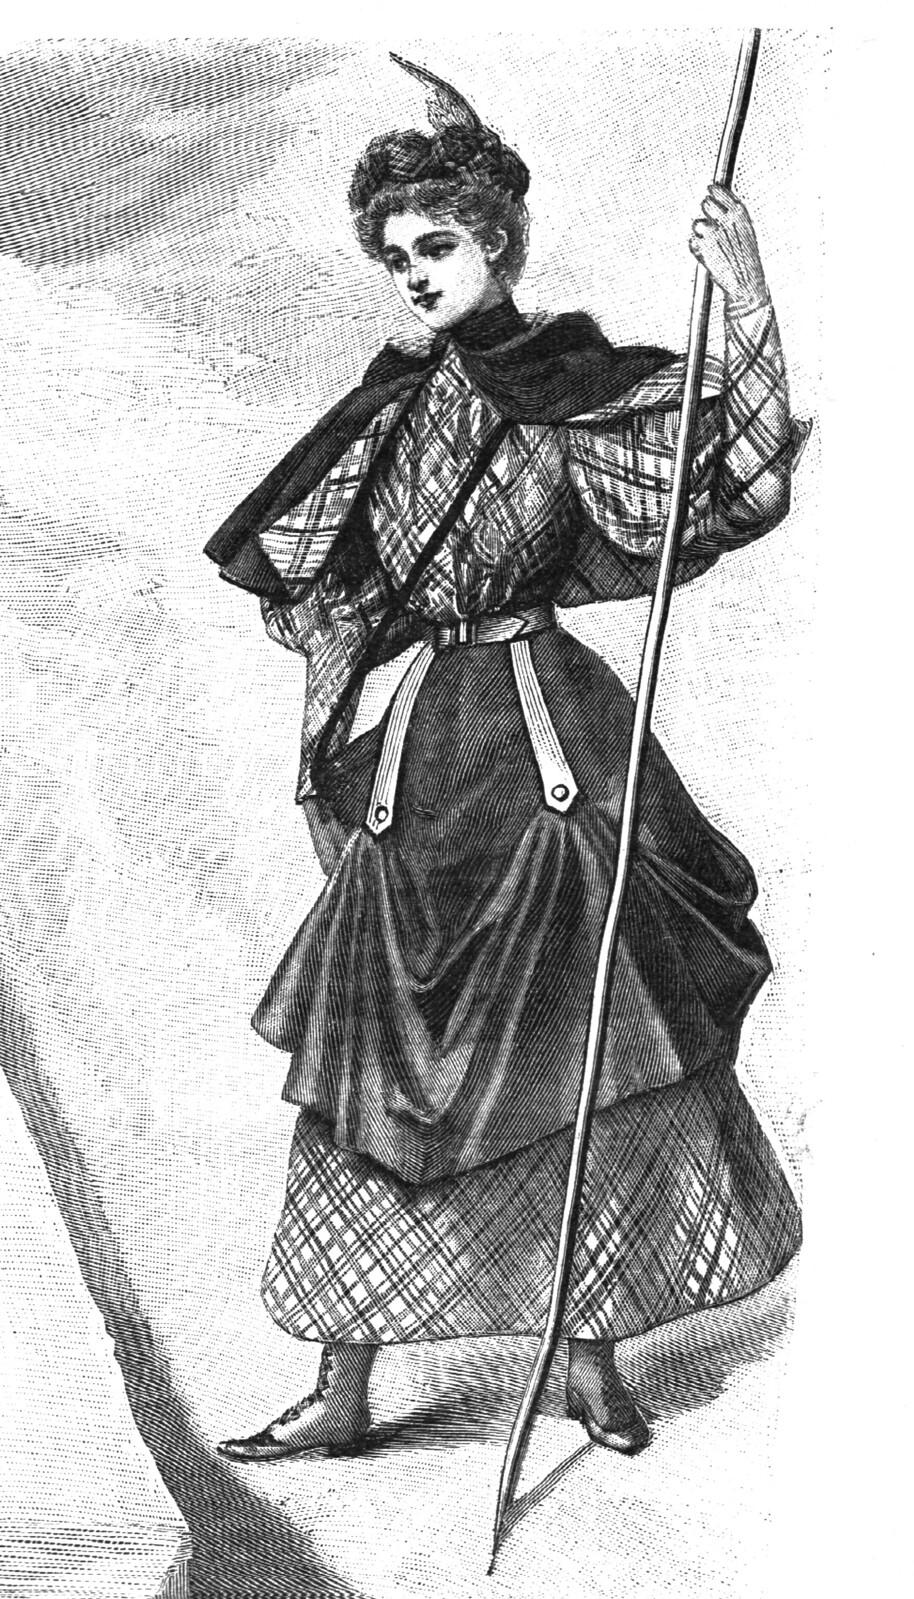 1895-05-19-excursion